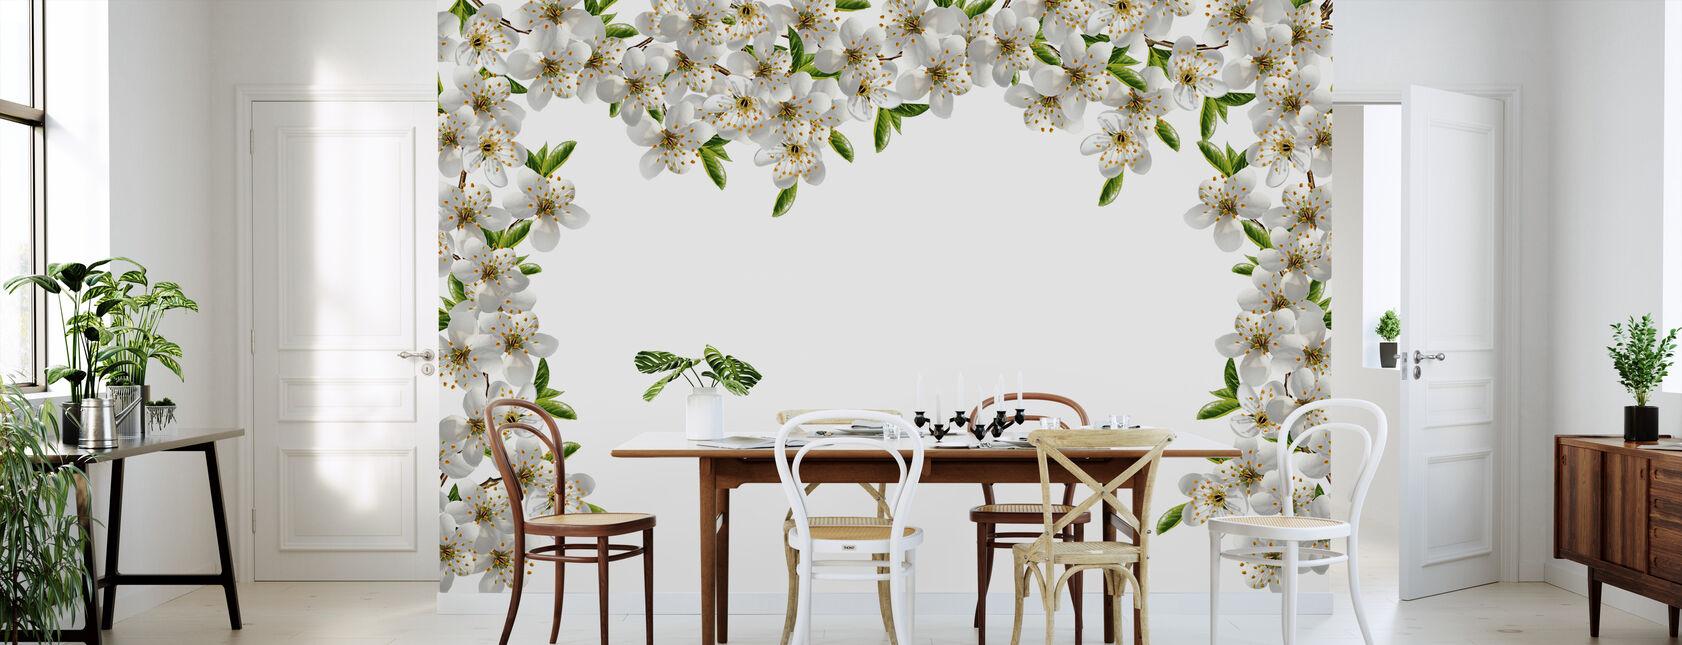 Frame of Flowers - Wallpaper - Kitchen